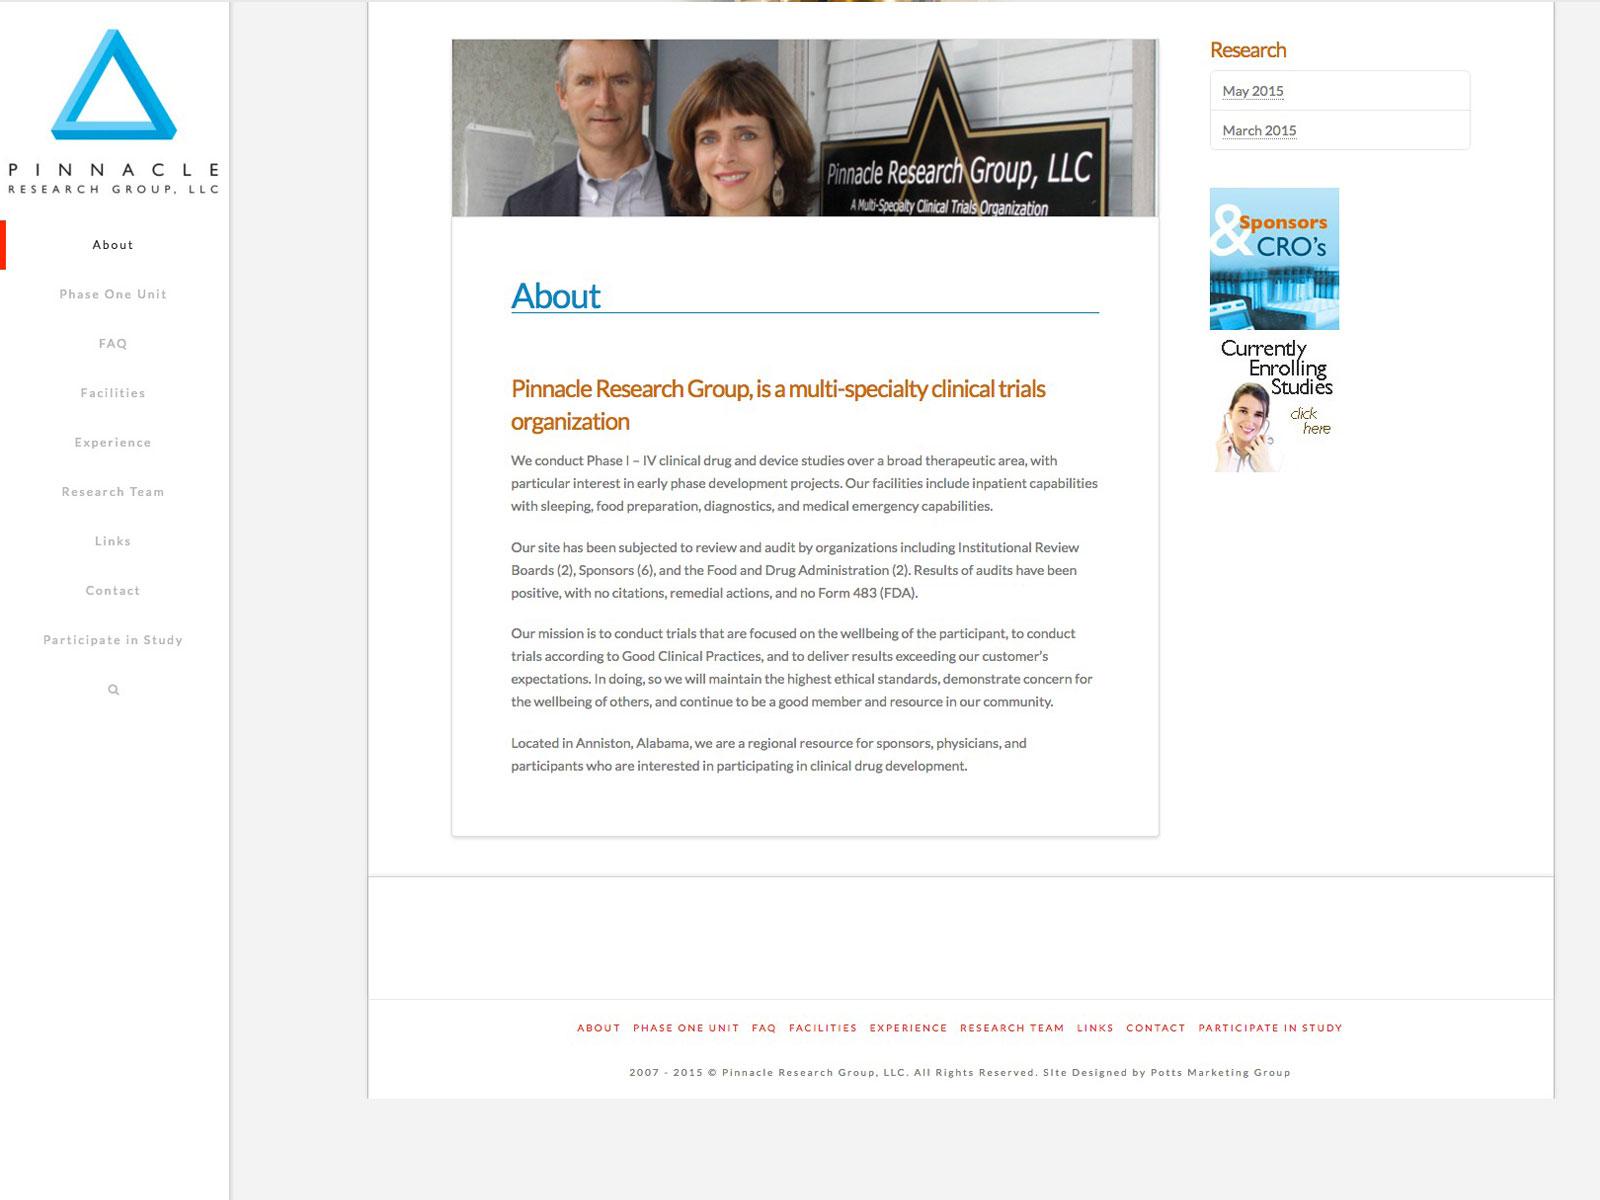 pinnacleresearch.com